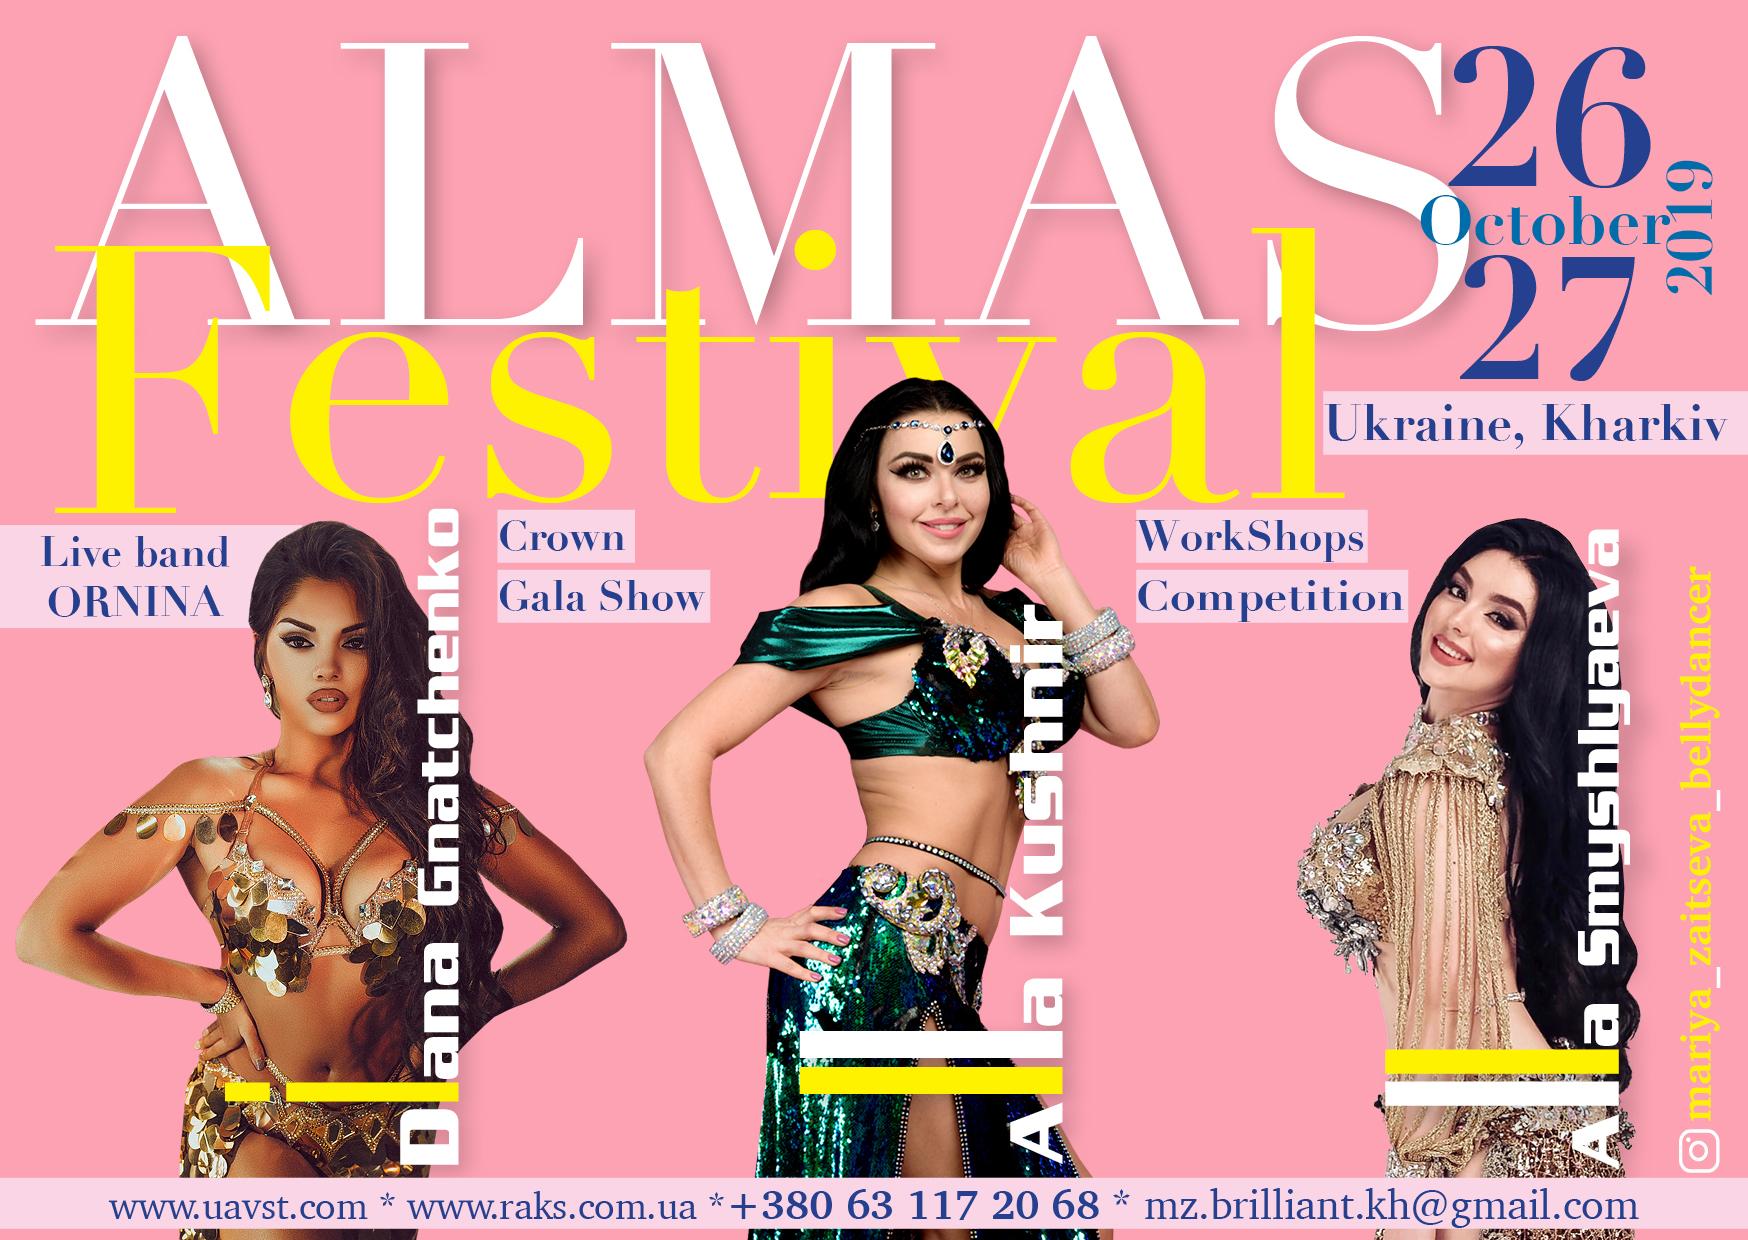 AlmasFestivalvoorkant2.jpg